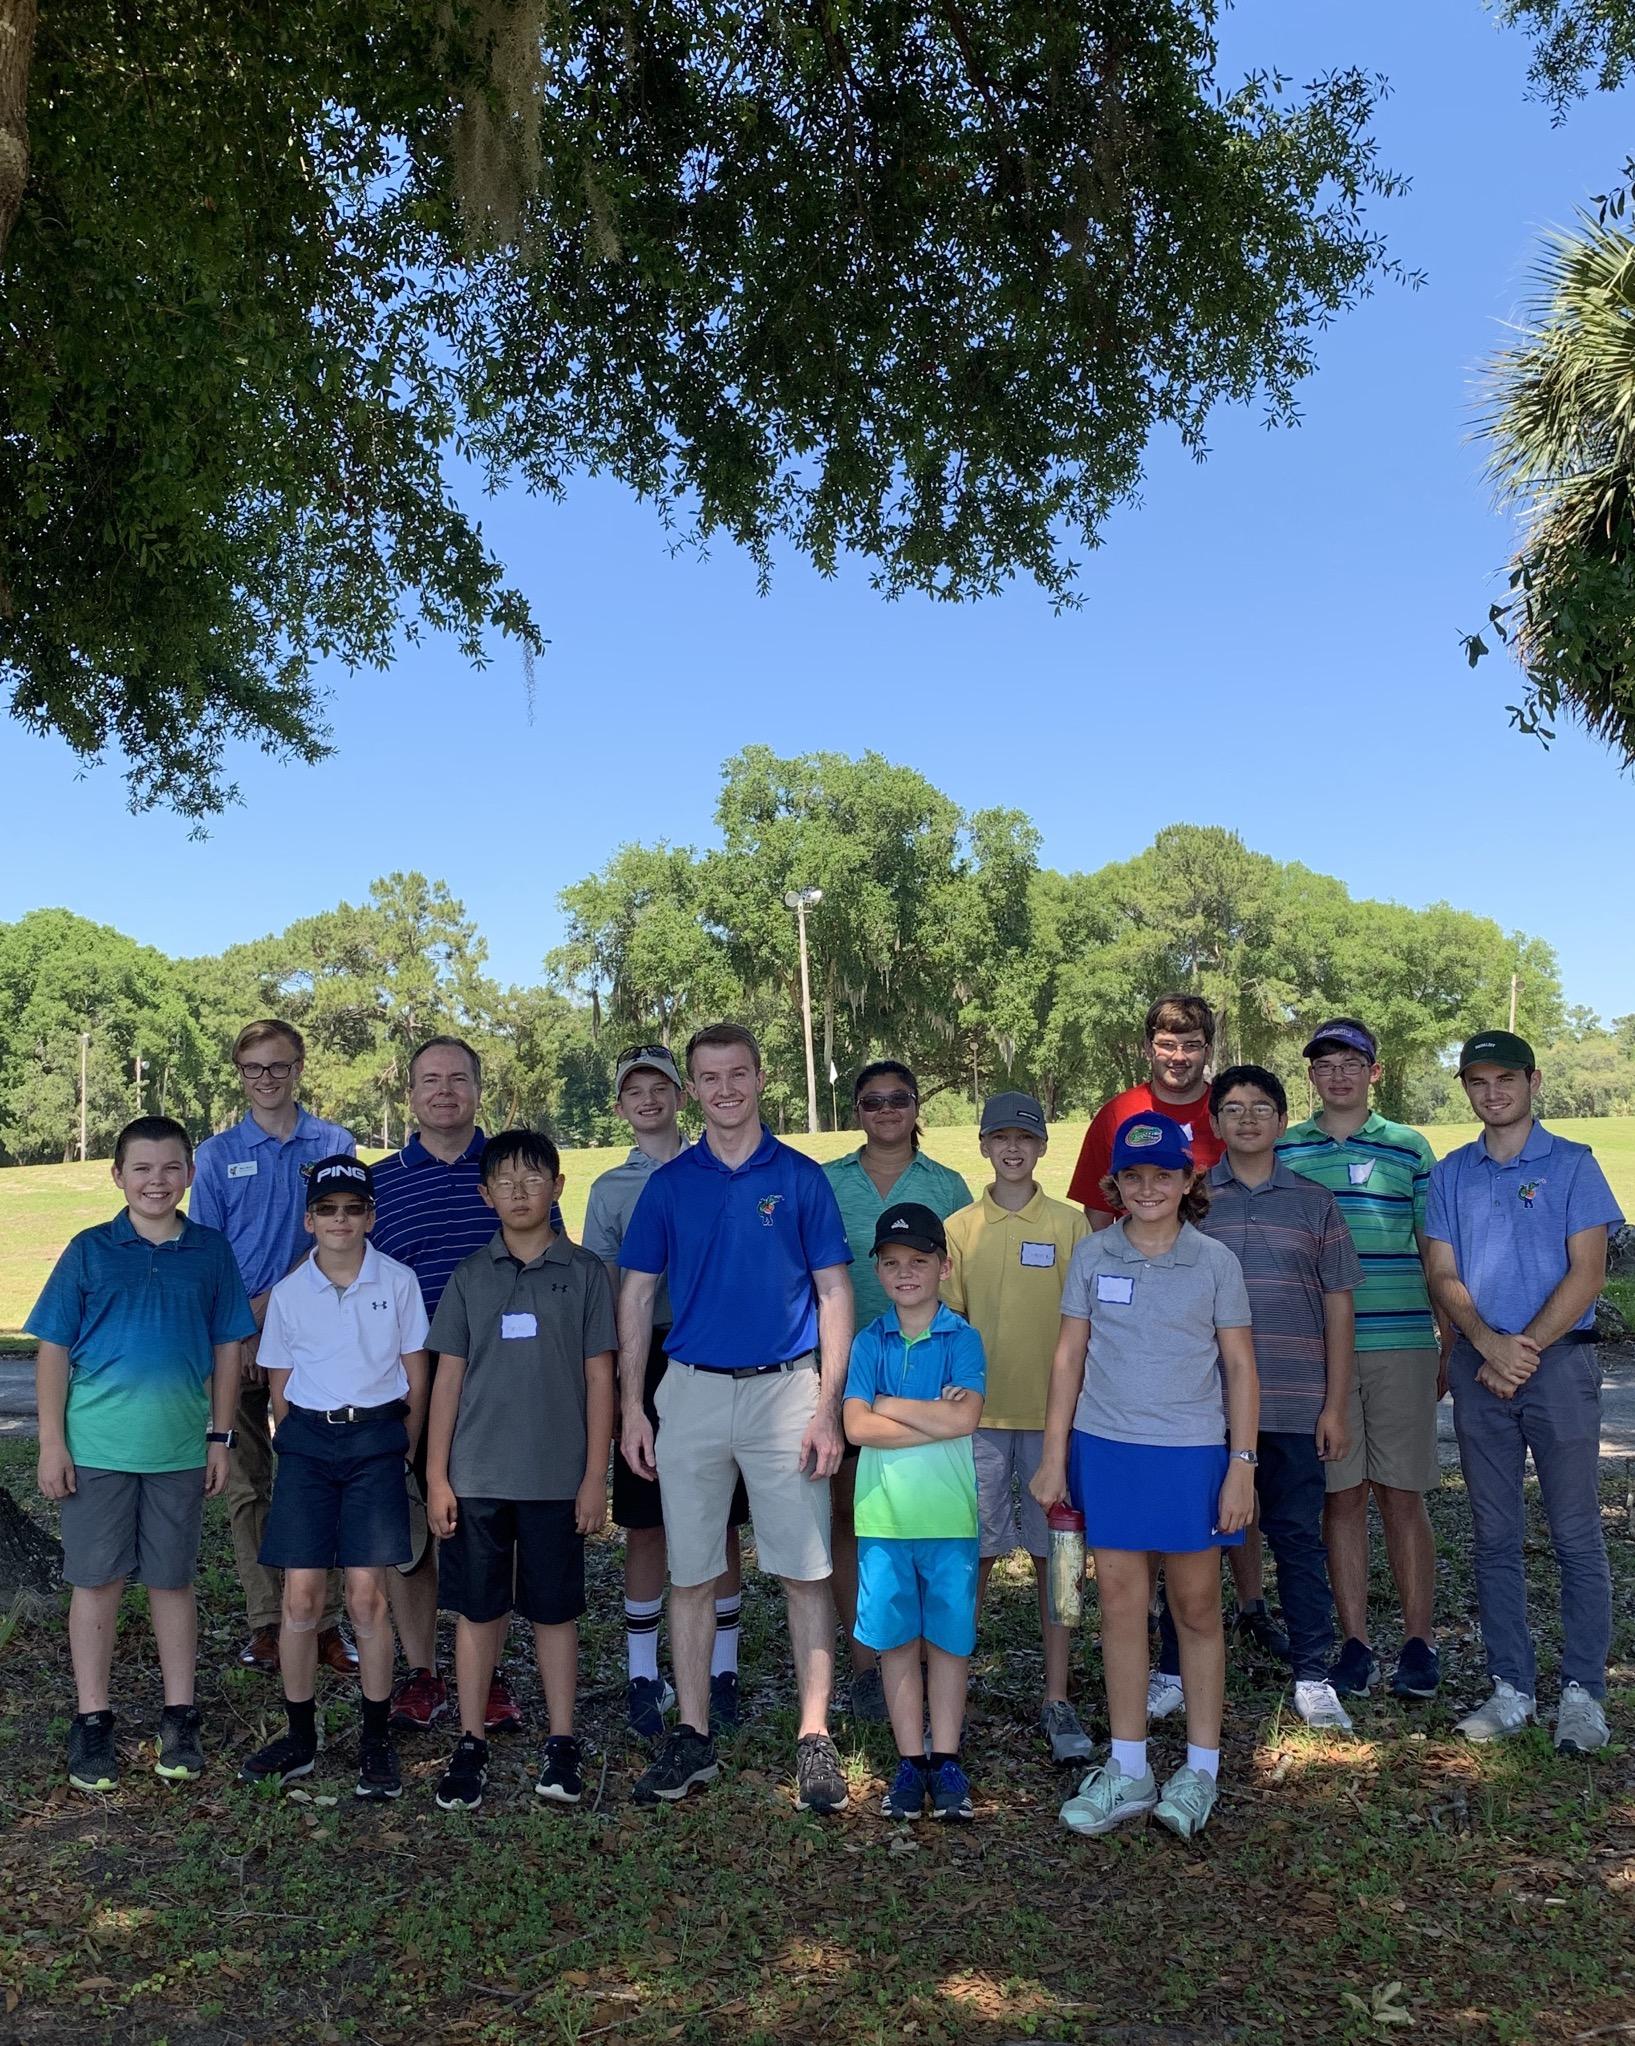 Spring 2019 Golf Classes -